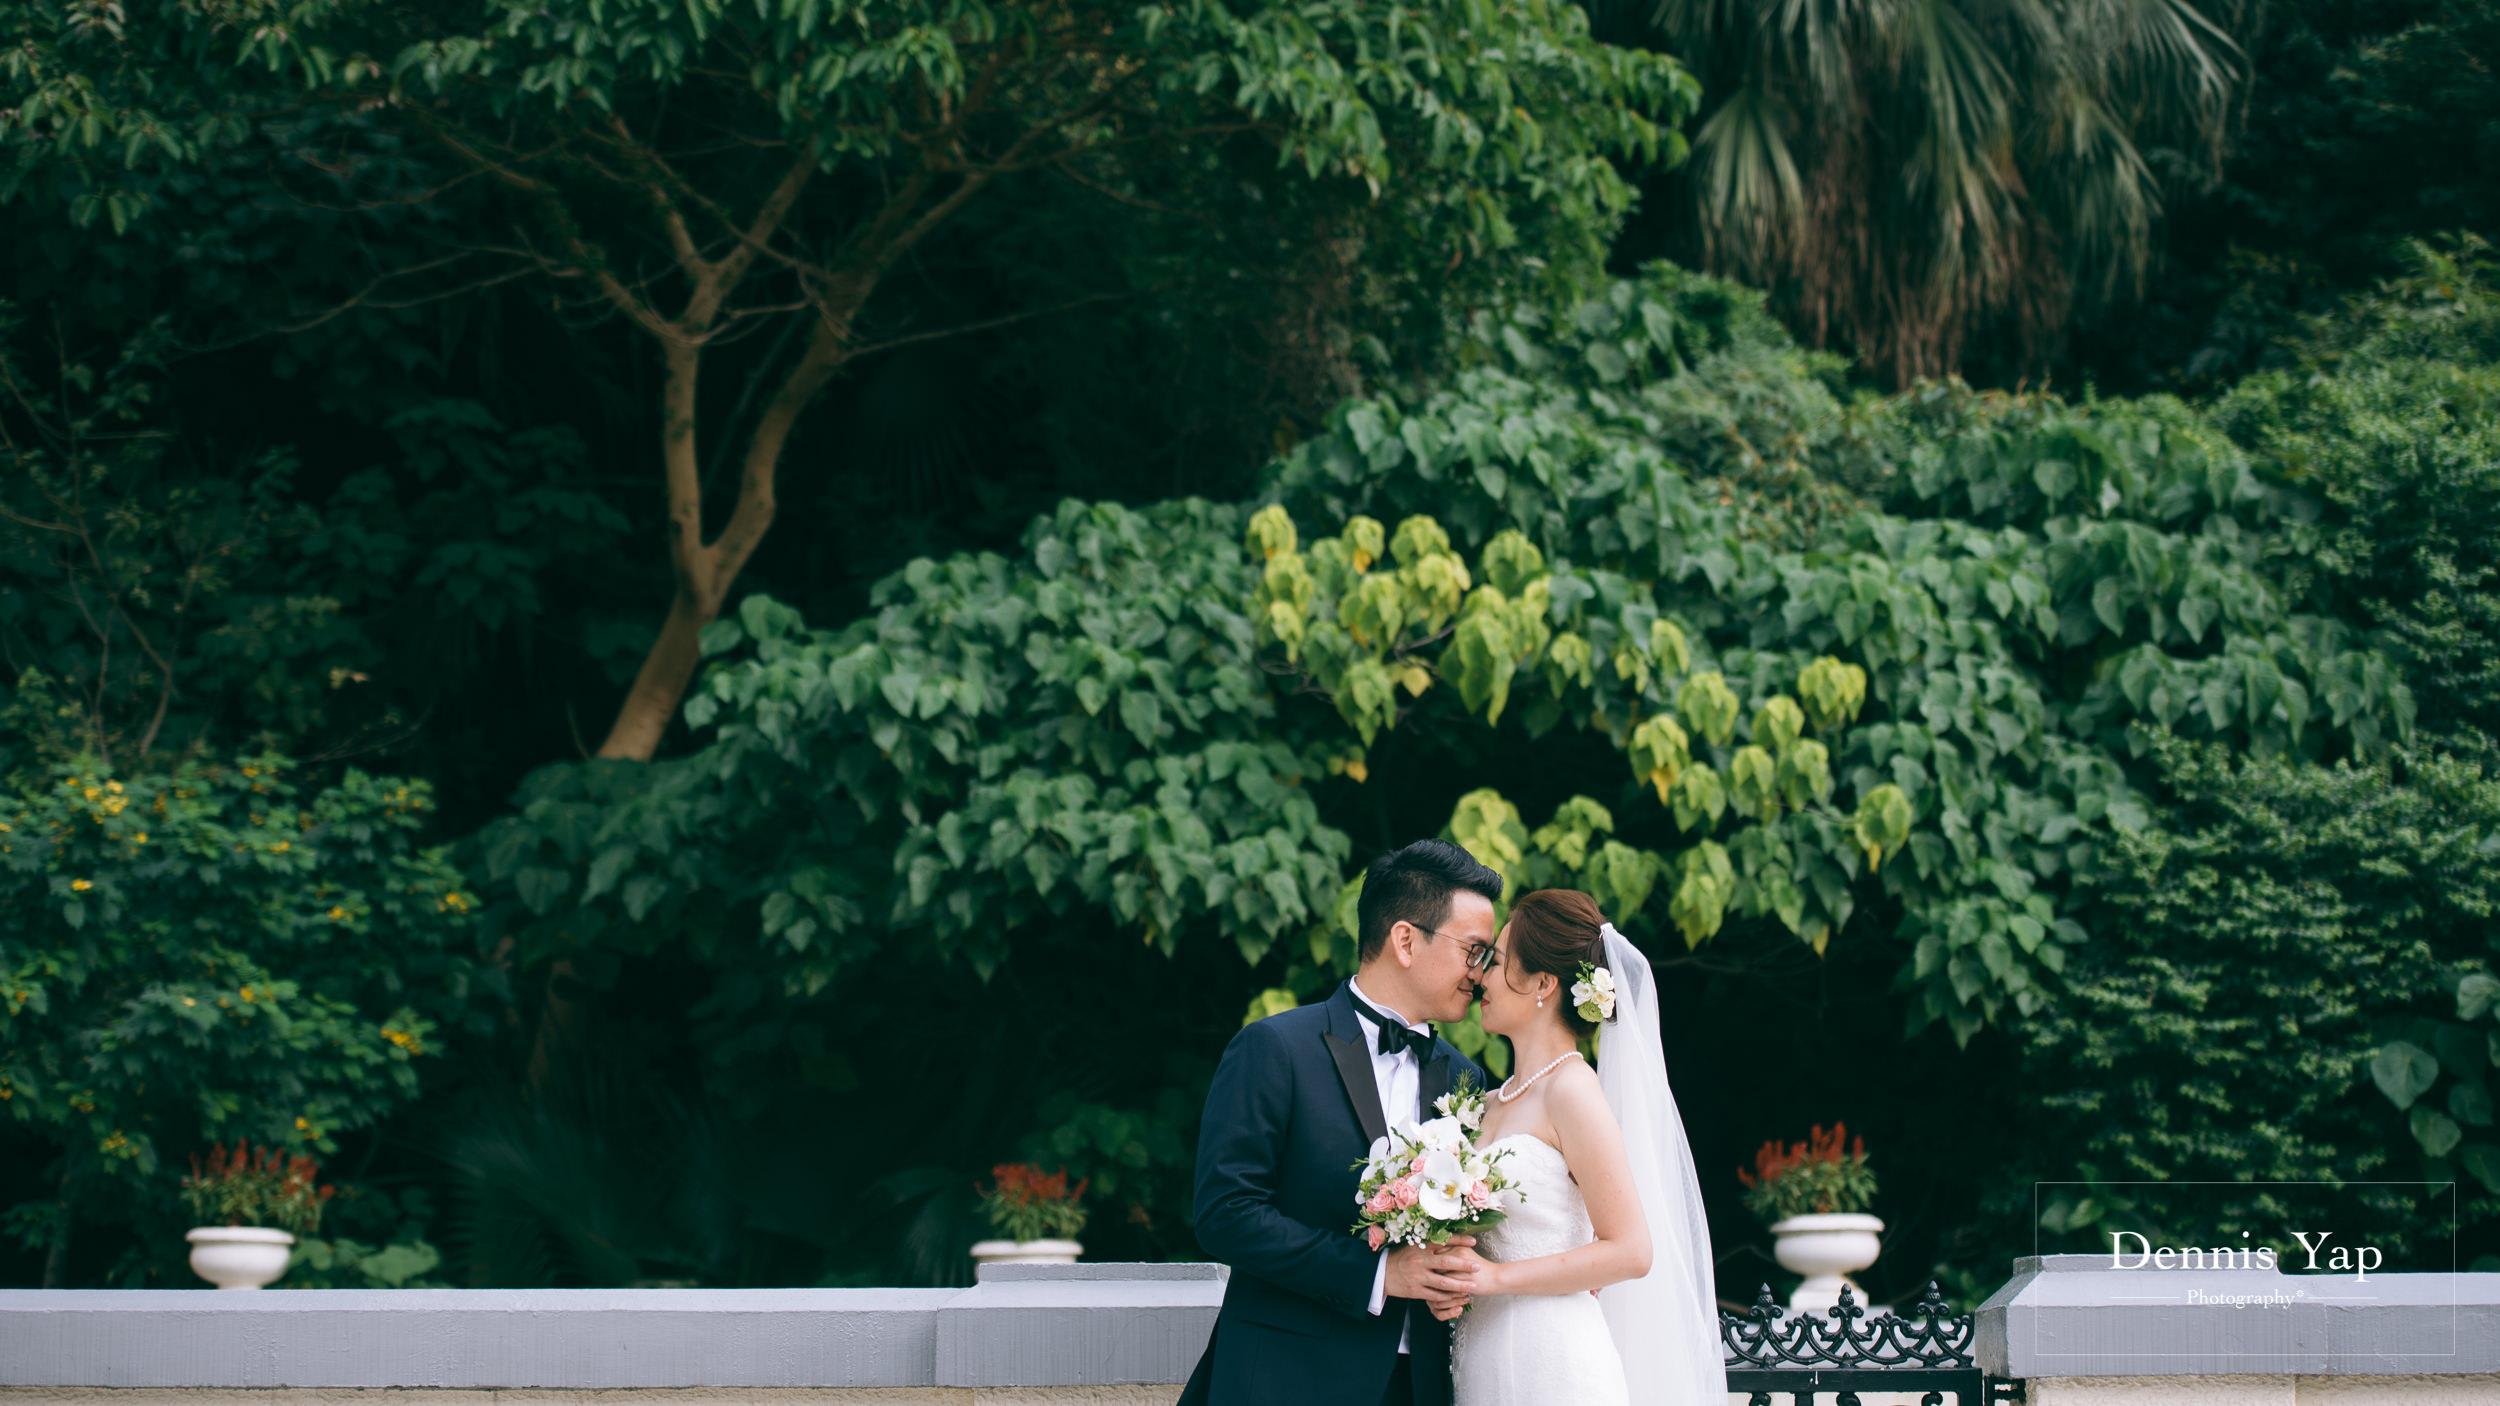 jason crystal wedding day gate crash hong kong garden wedding dennis yap photography-19.jpg